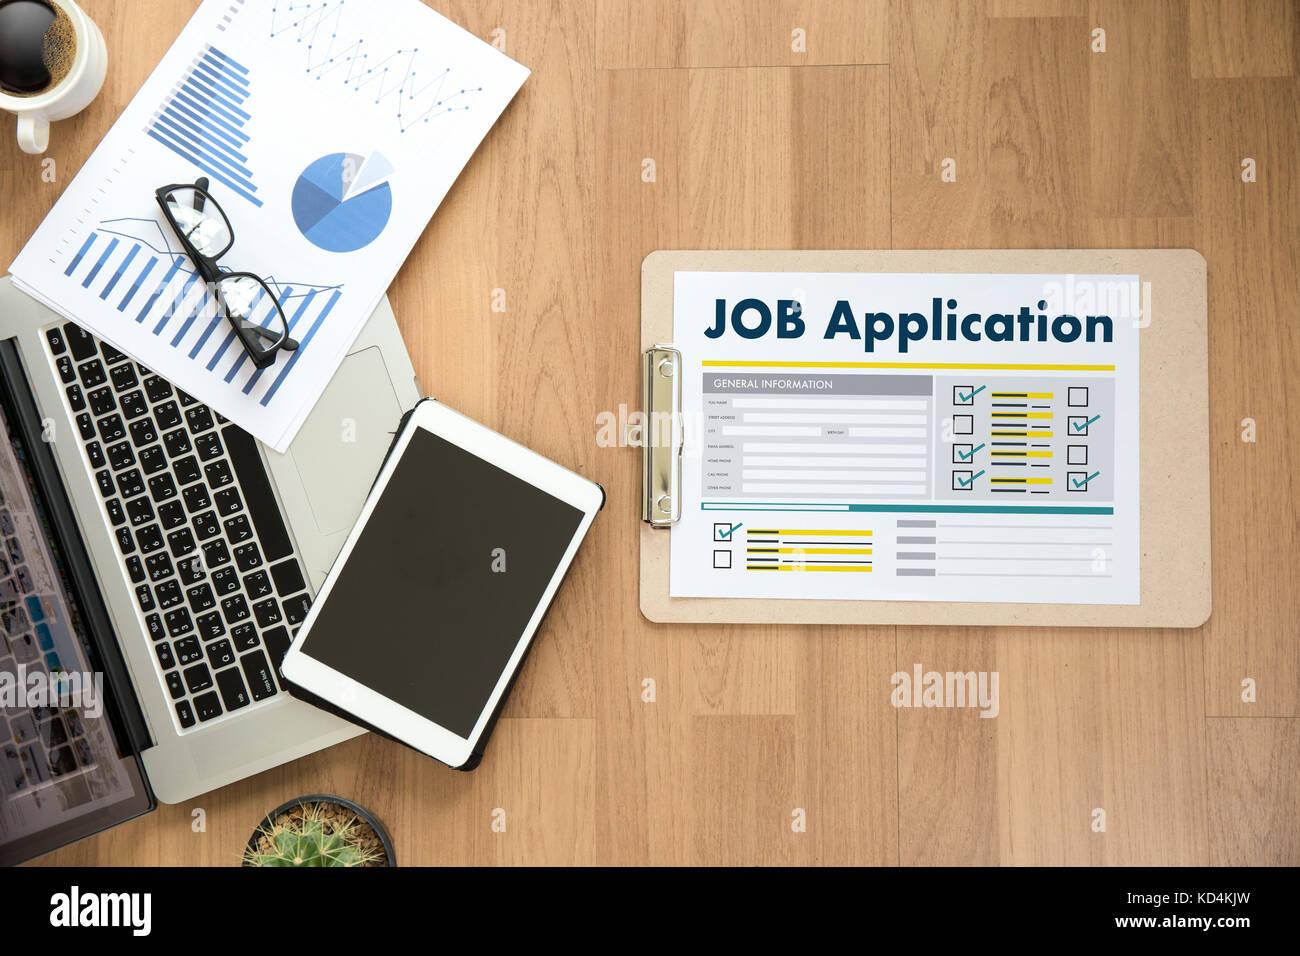 applications online for jobs hiring